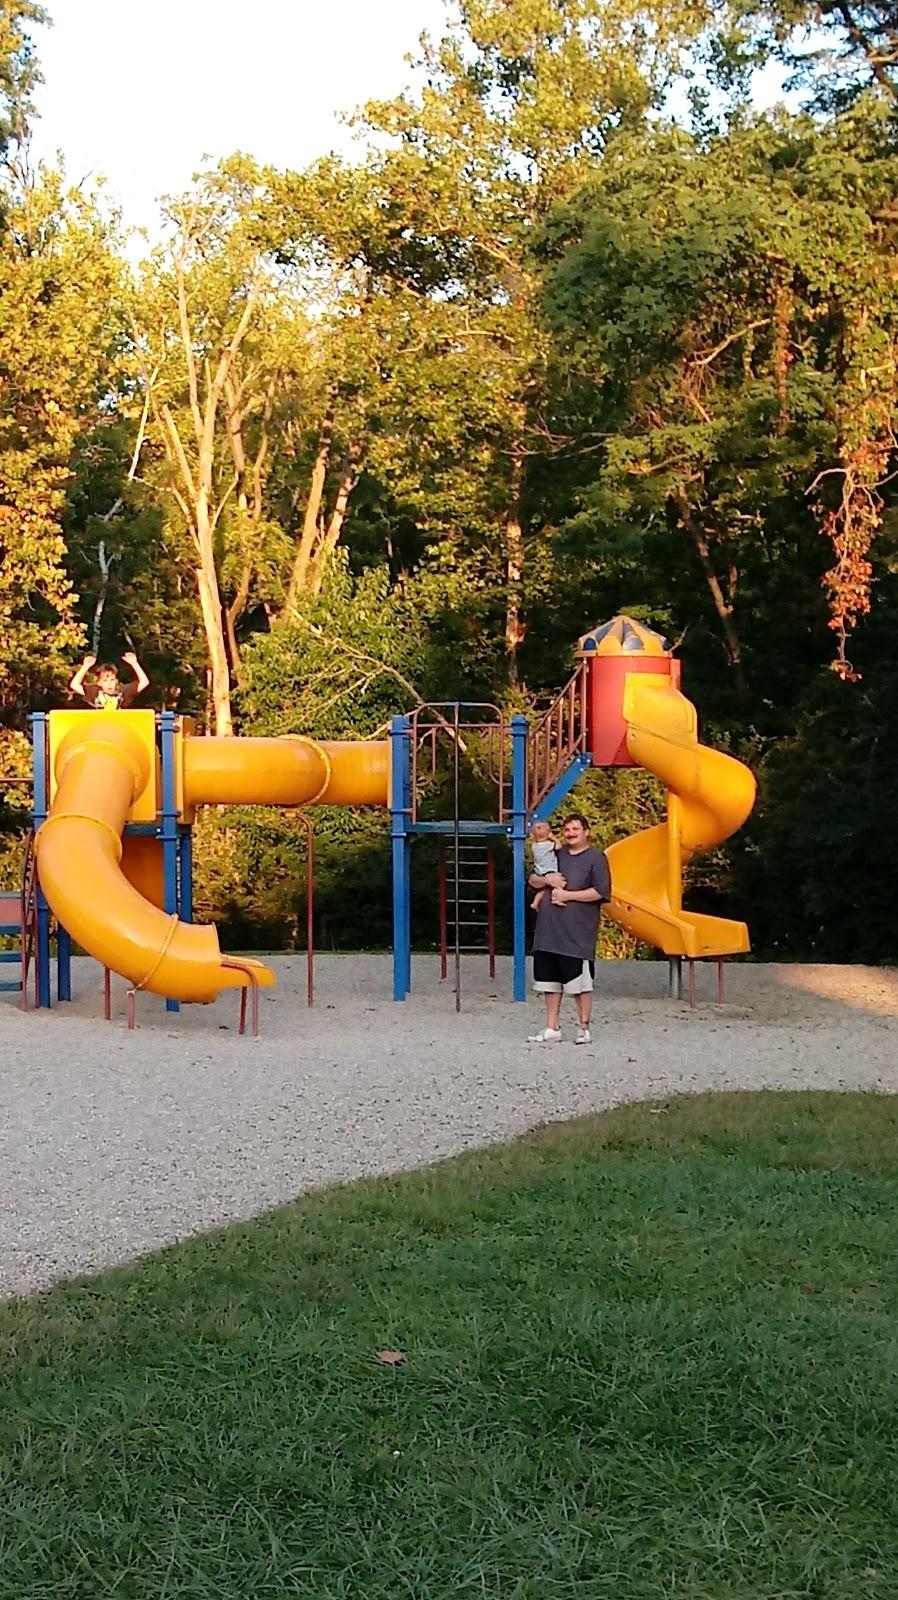 Summerside Elementary School - school    Photo 7 of 10   Address: 4639 Vermona Dr, Cincinnati, OH 45245, USA   Phone: (513) 947-7900